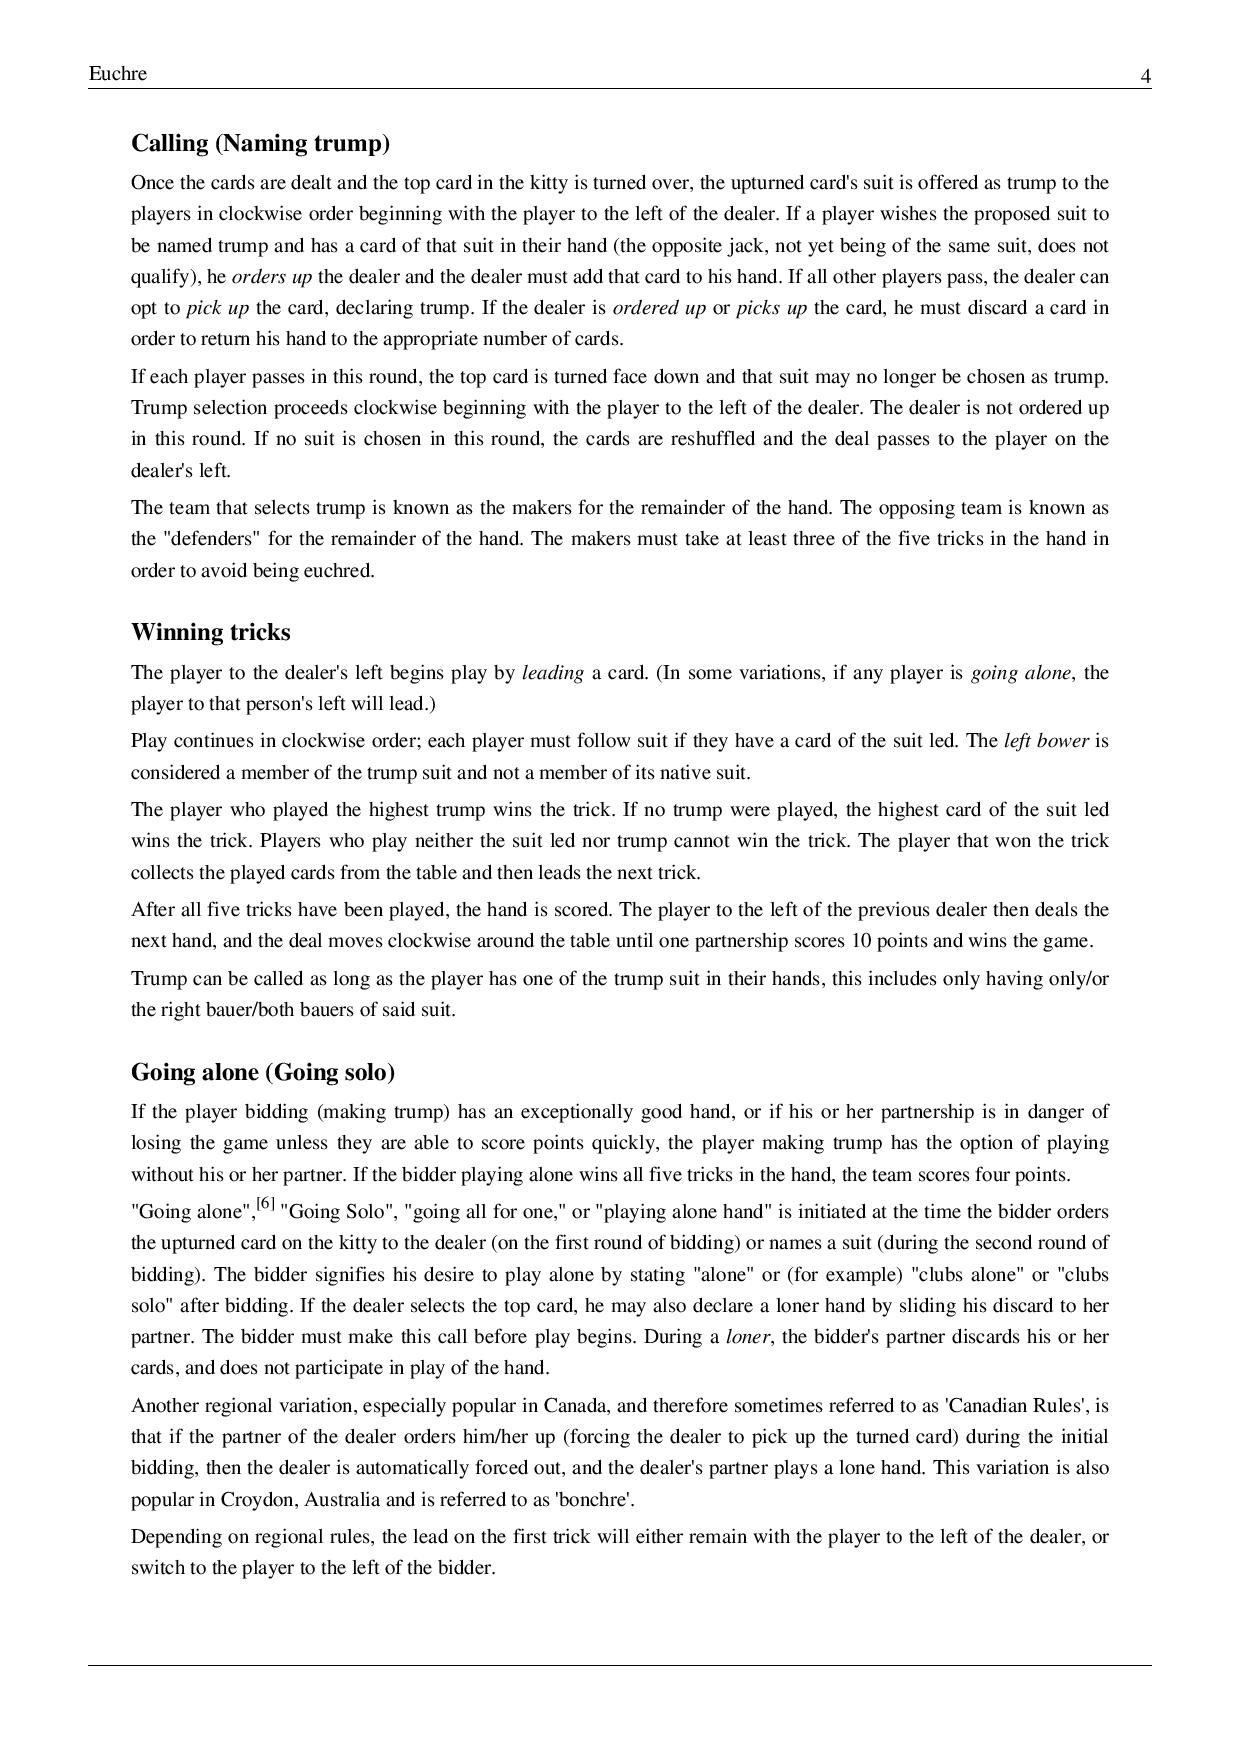 basiceuchrerulespage004.jpg Euchre, Poker cards, Rules